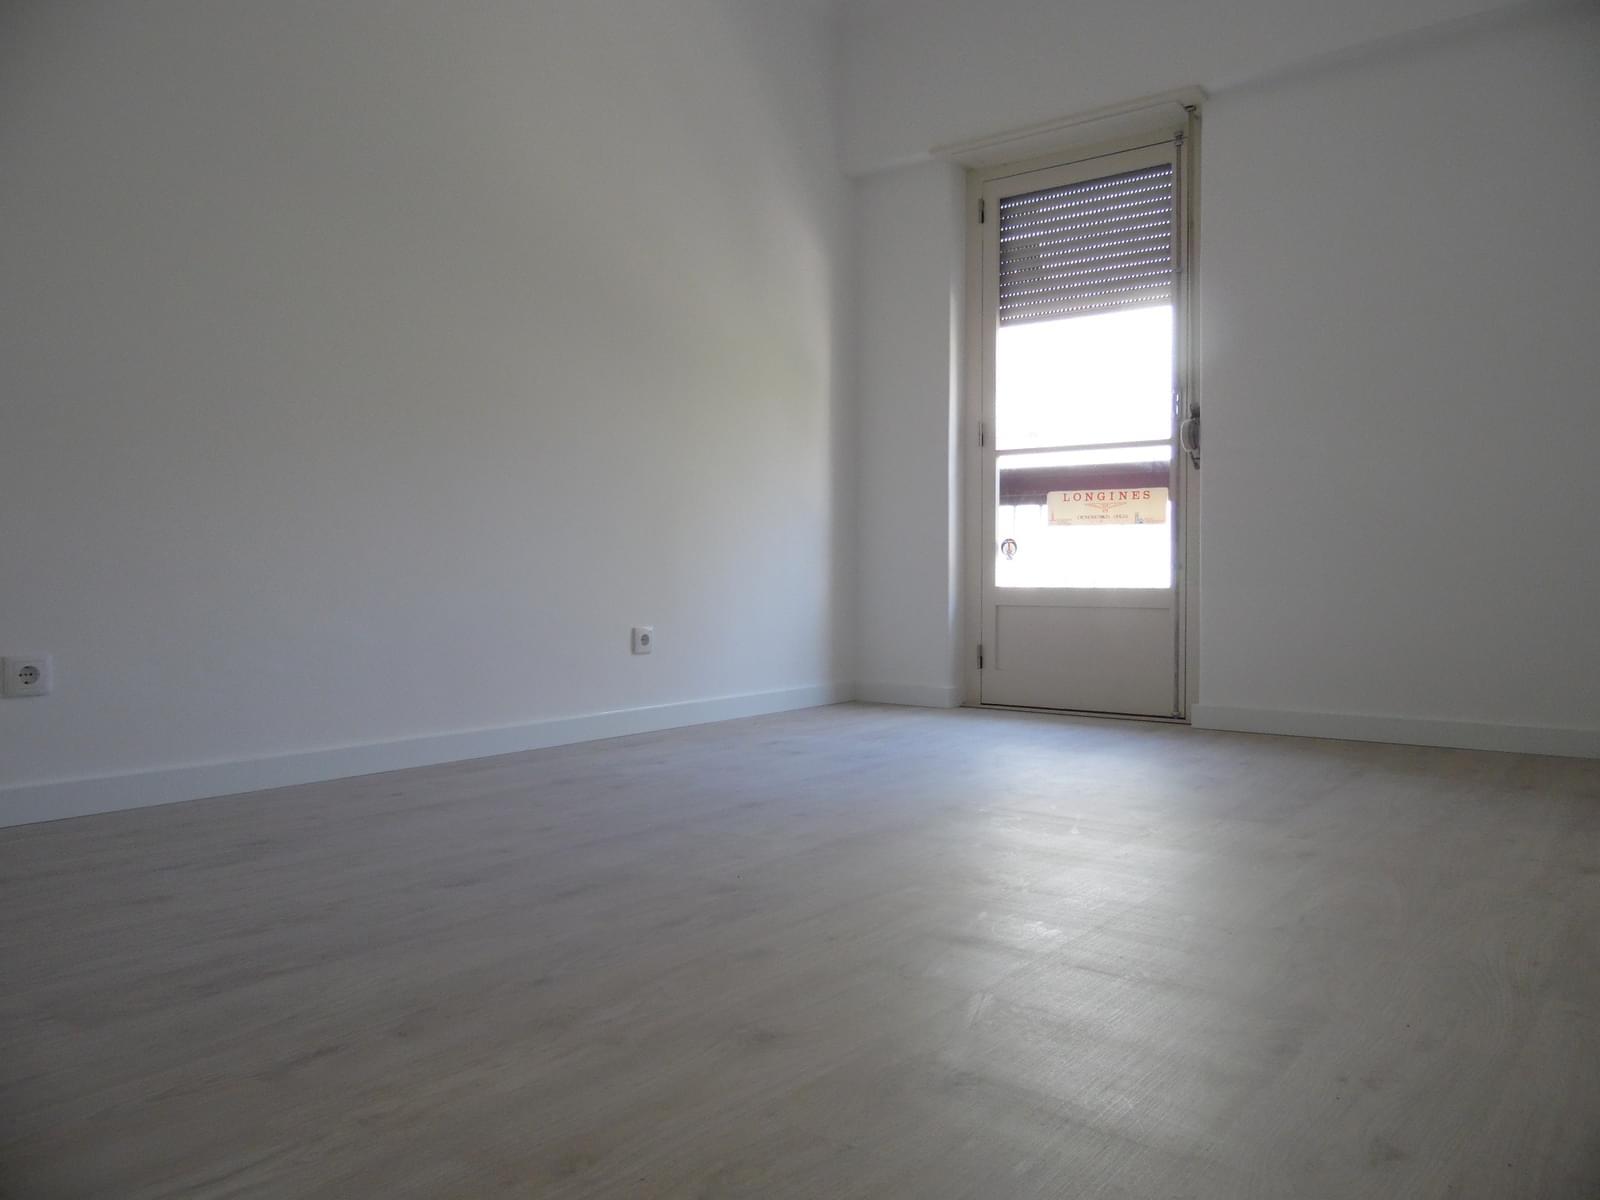 pf17195-apartamento-t3-oeiras-8b996034-fef6-4e1e-8261-fdd1a22357ba